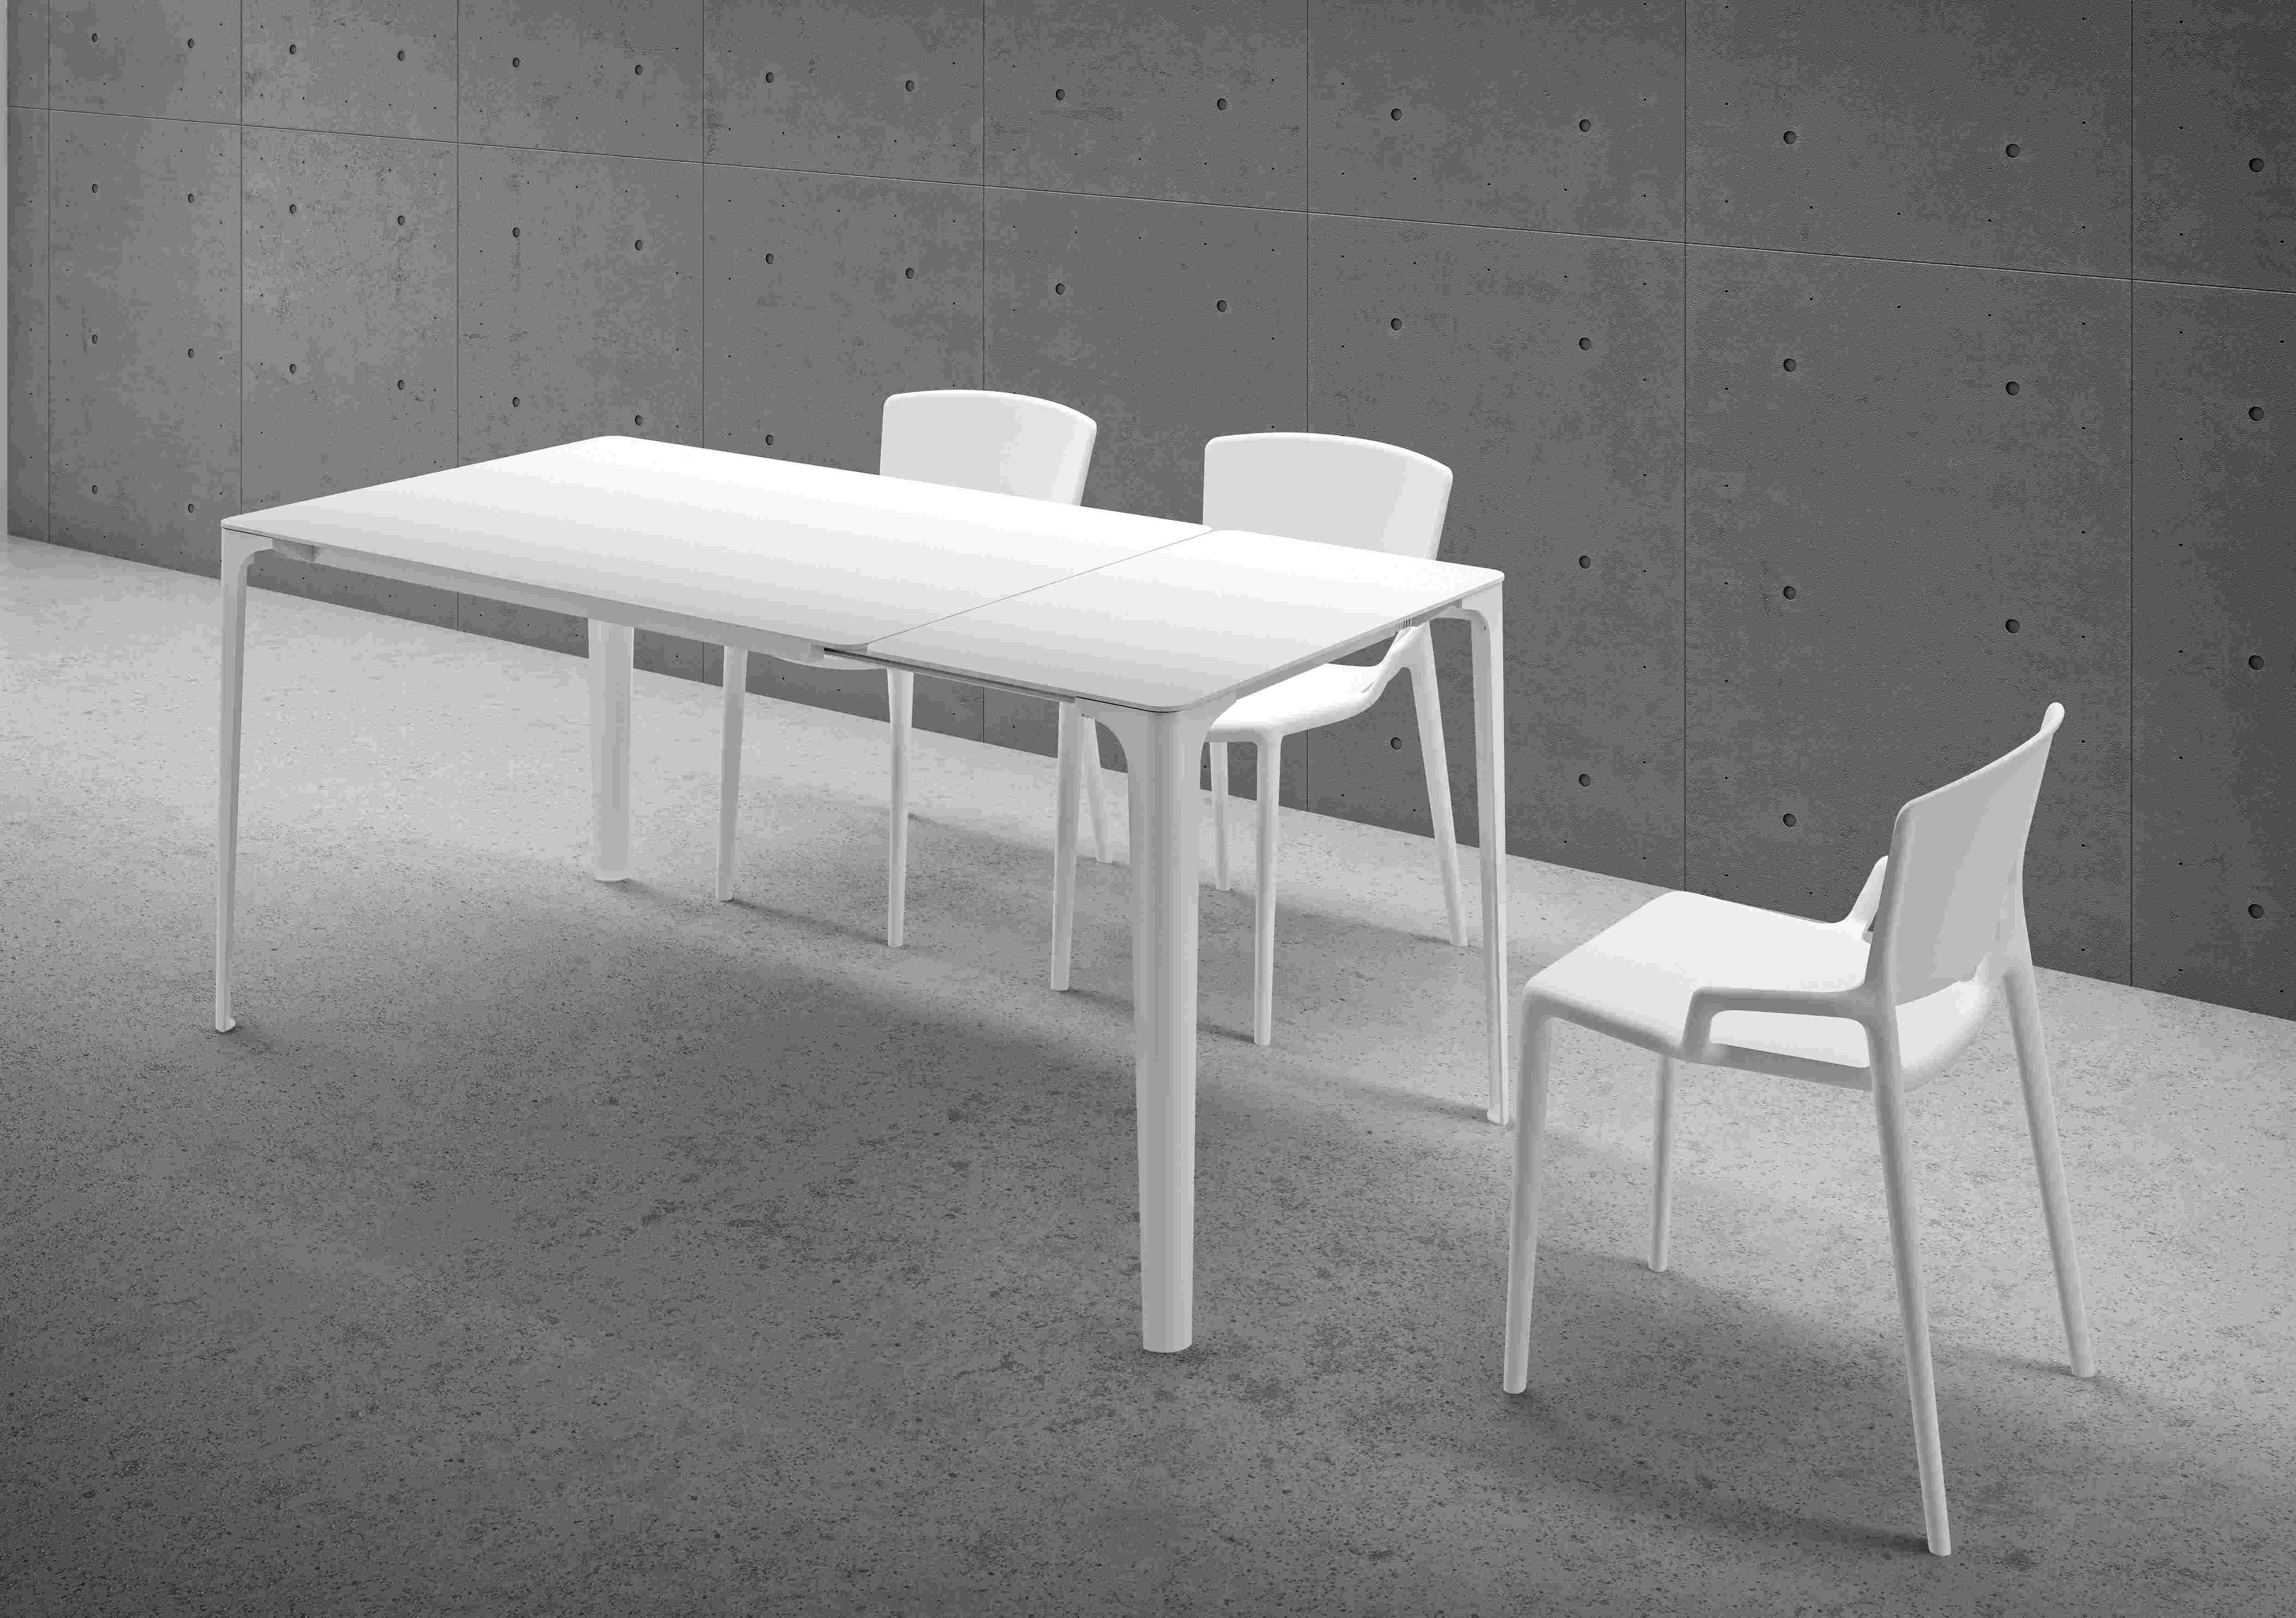 table mat 2